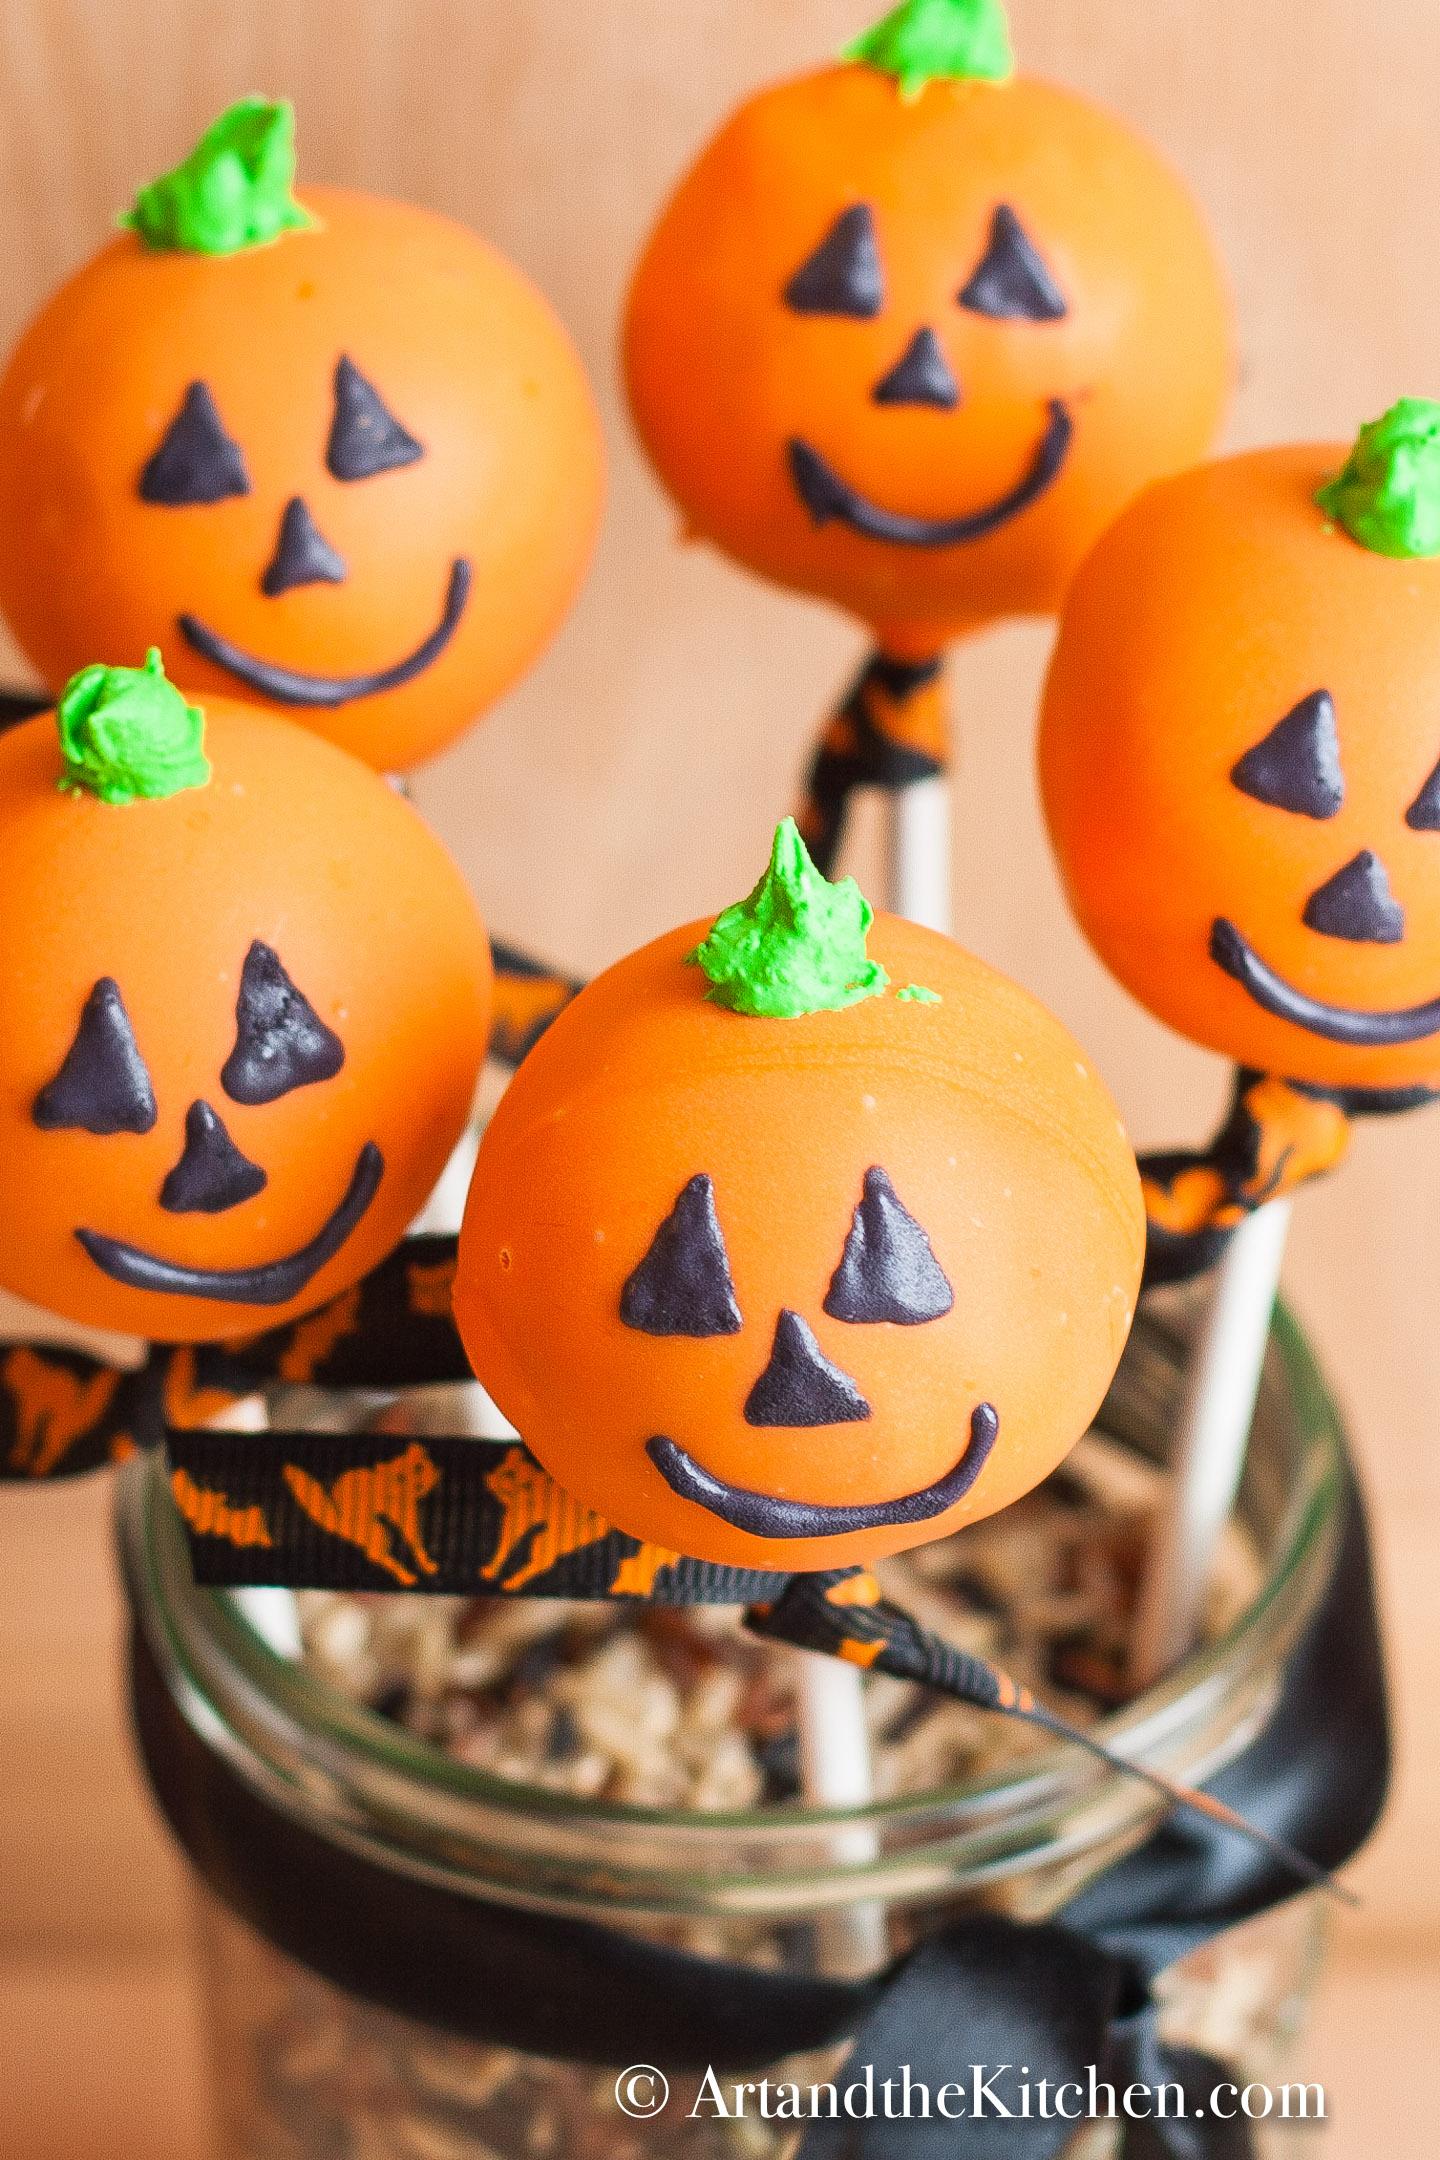 Five orange colored cake pops decorated like jack o lanterns displayed in a decorative jar.